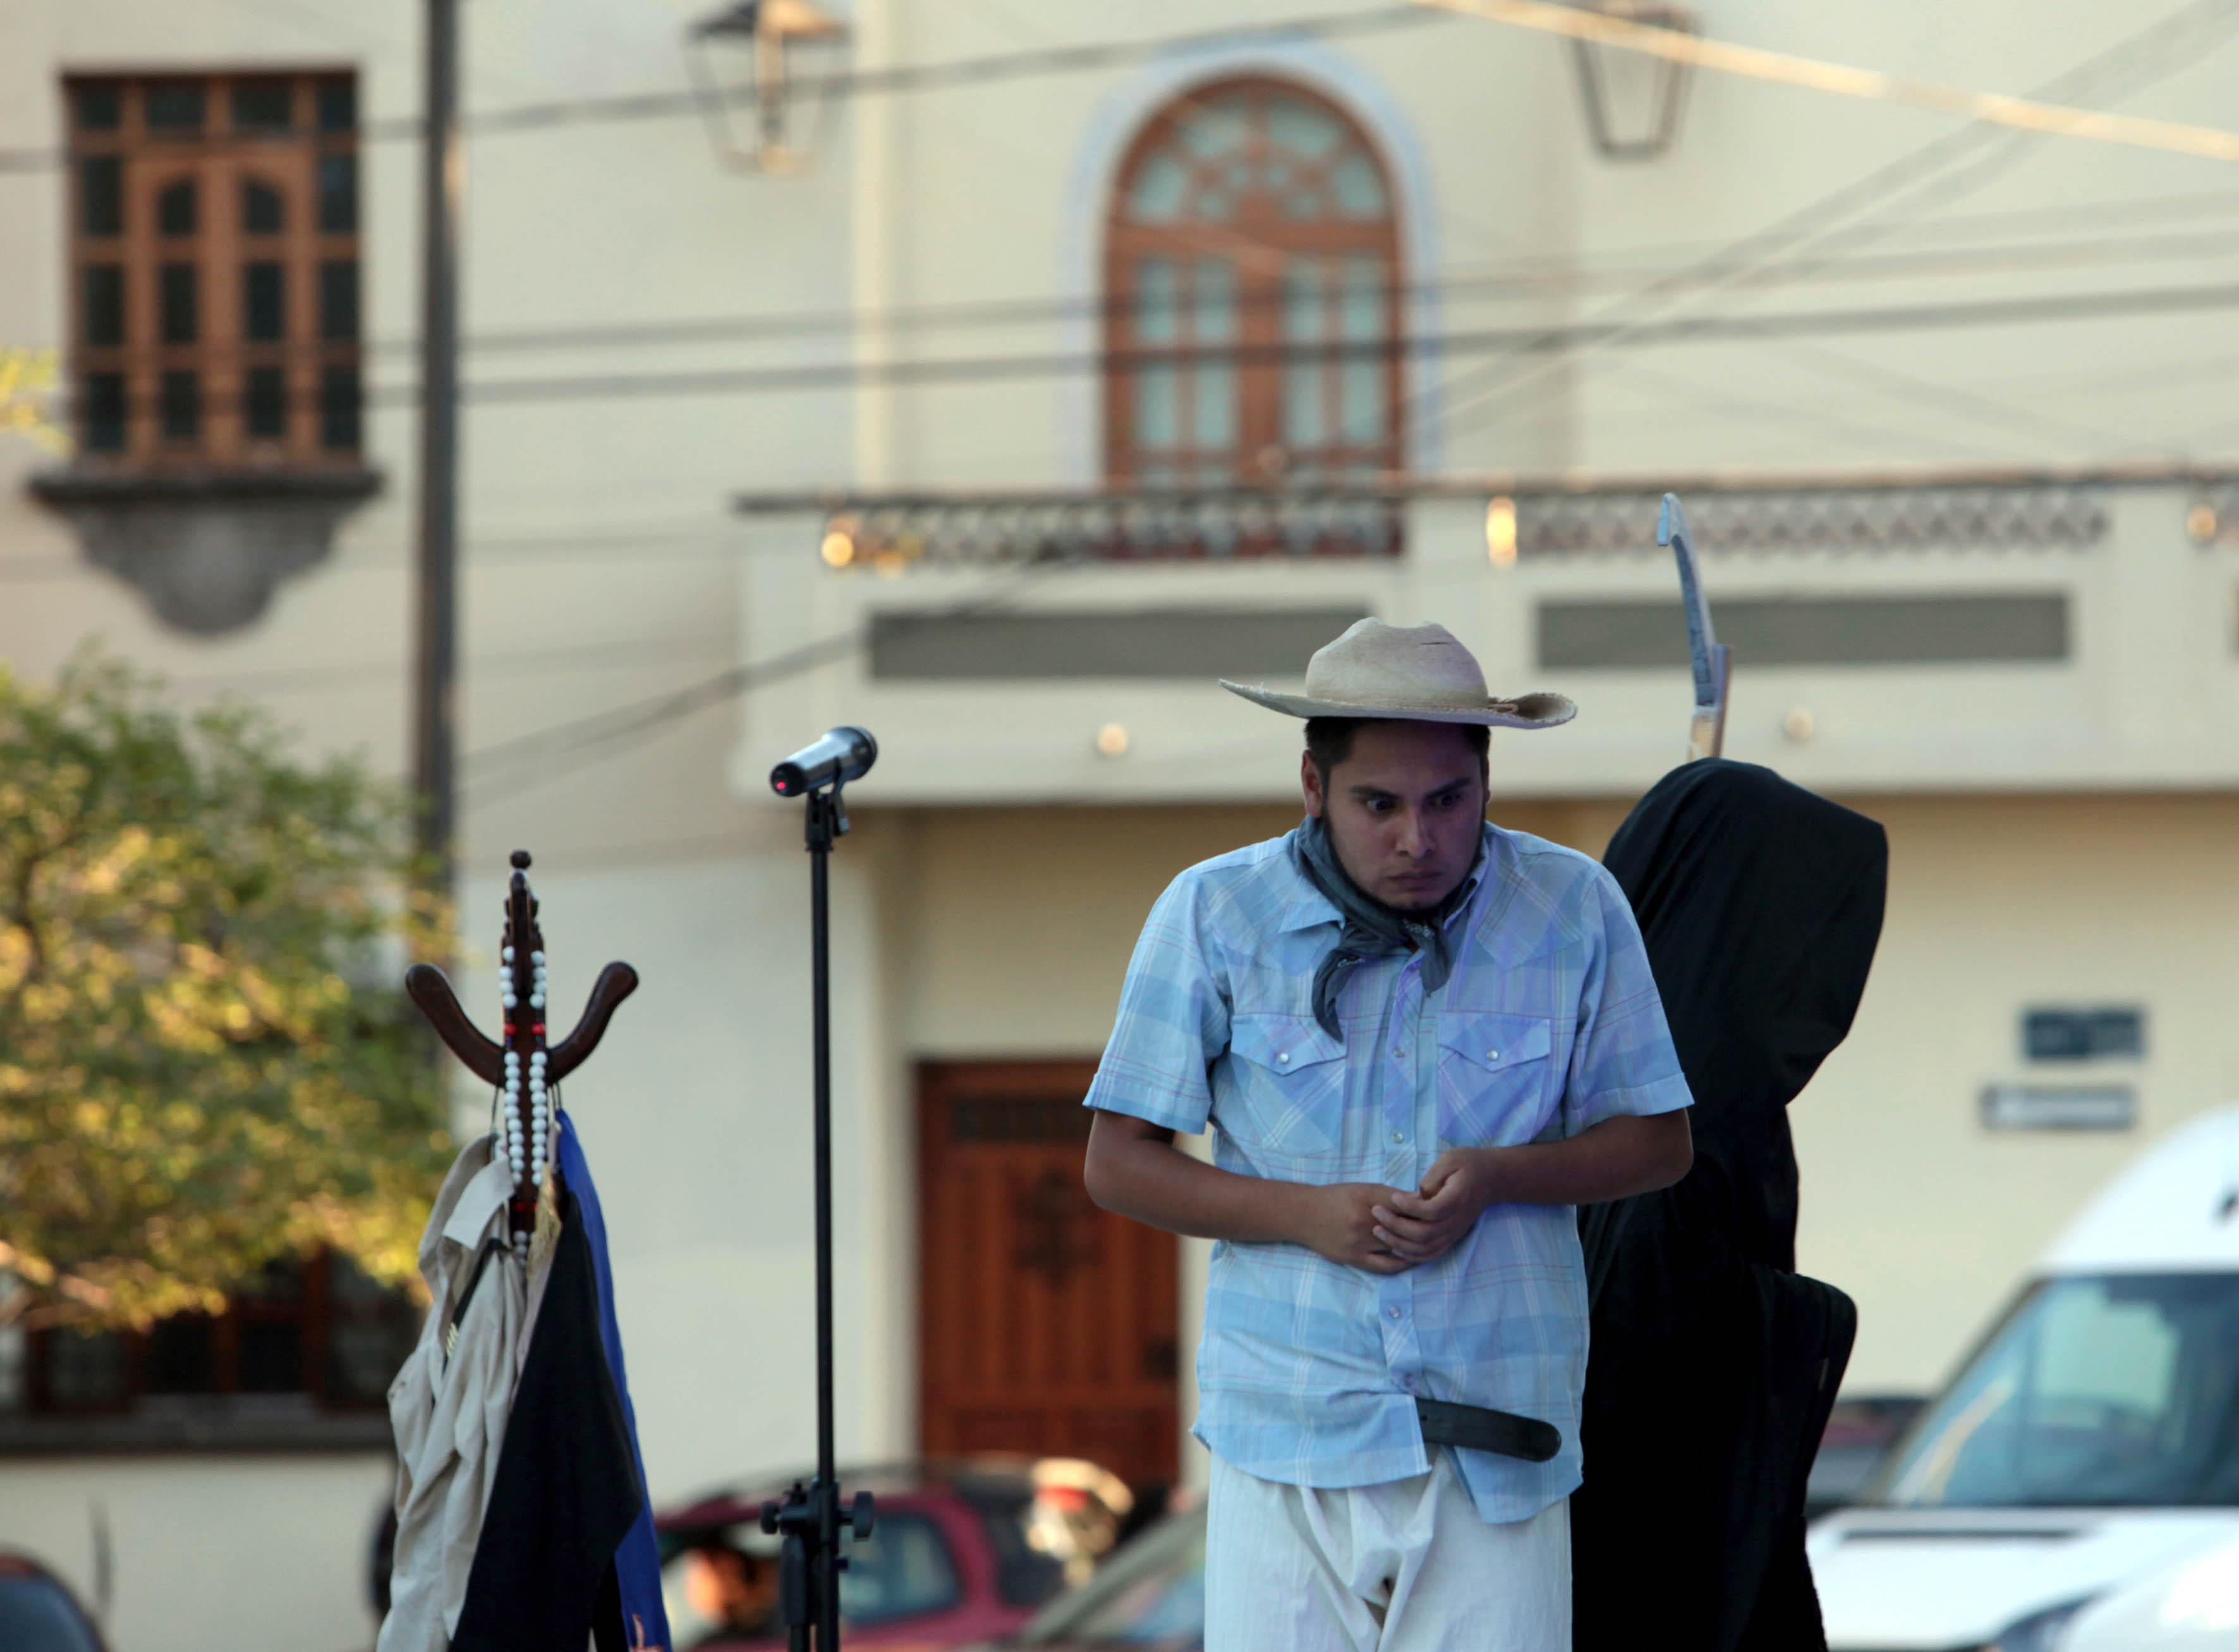 Integrante de la obra de teatro presentada en la Rambla Cataluña